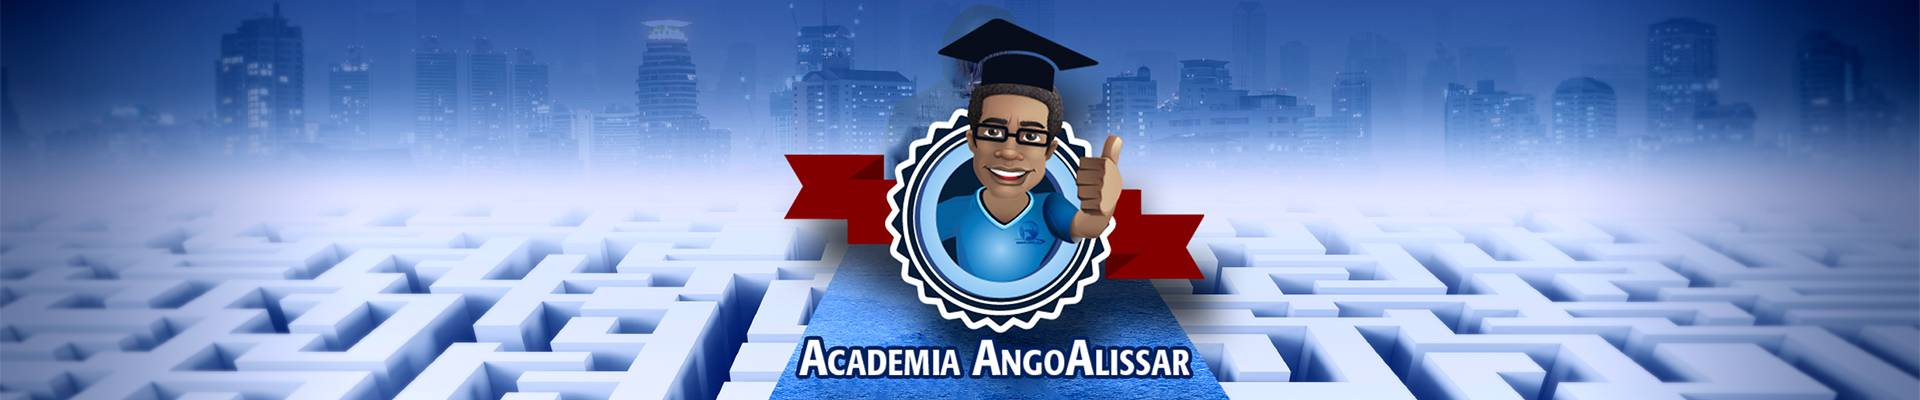 angoalissar academia 01